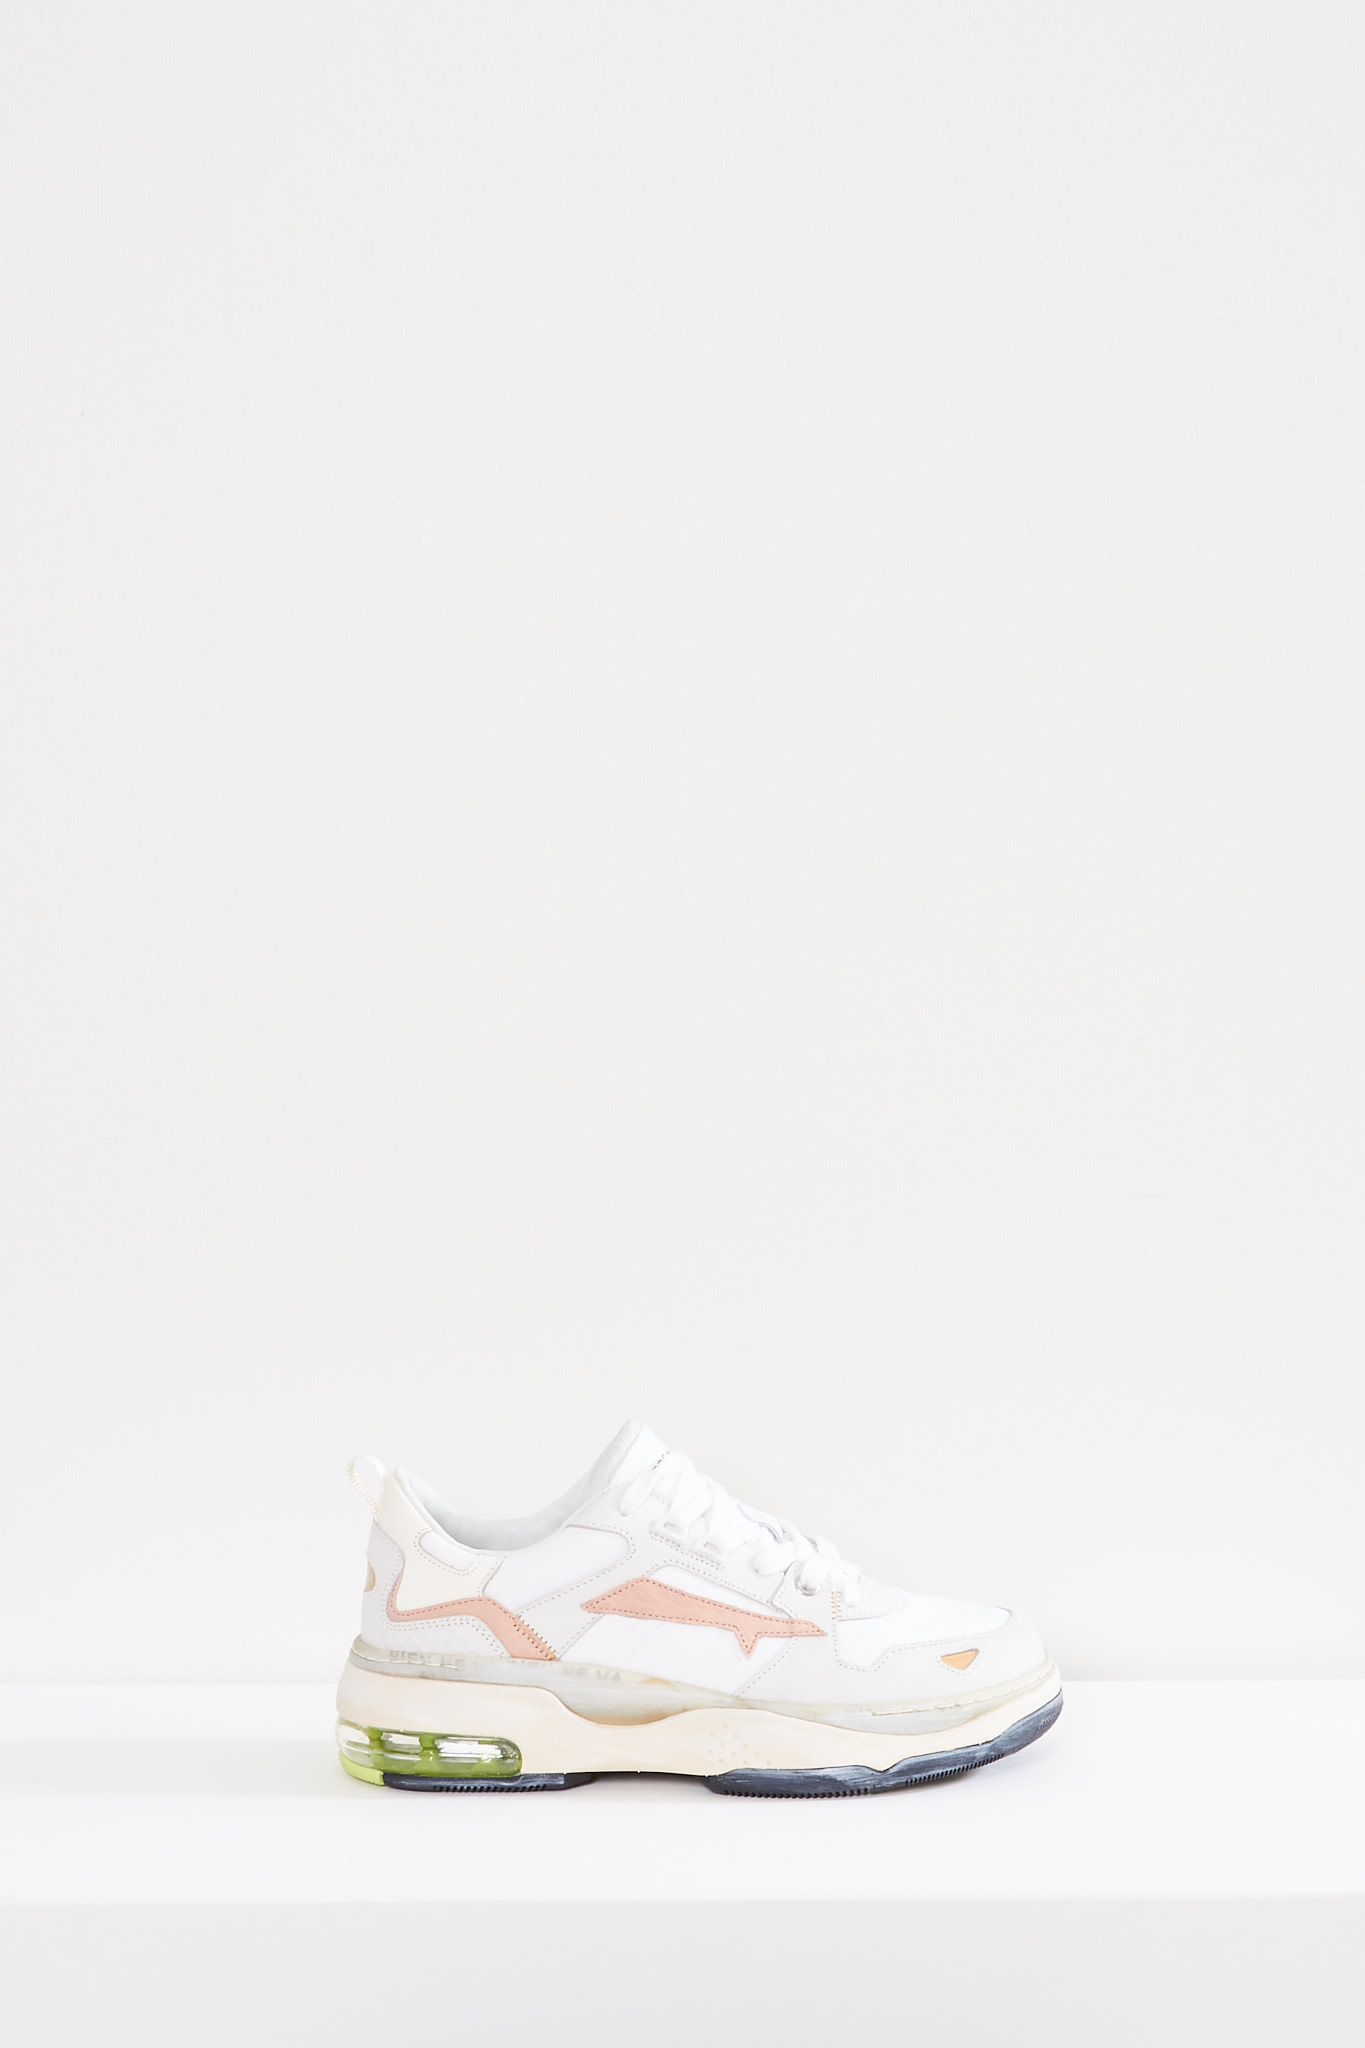 Premiata - Draked sneaker